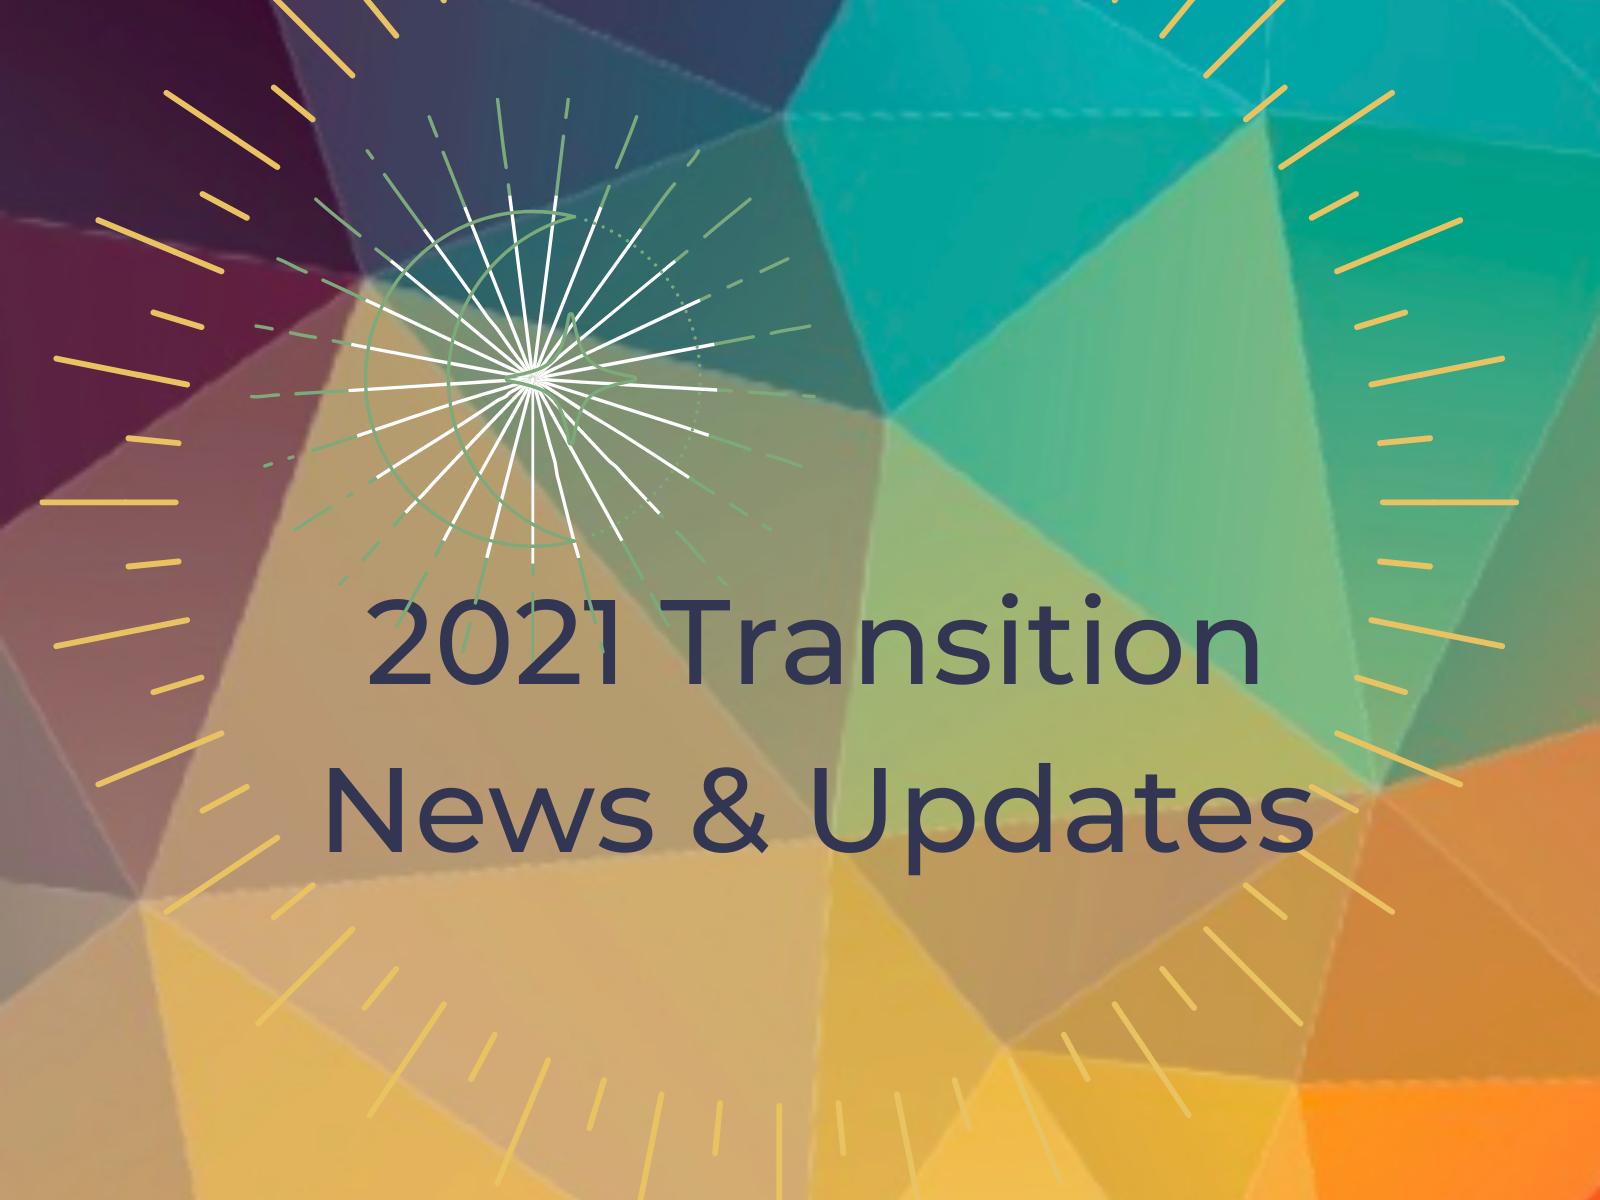 2021 Transition News & Updates